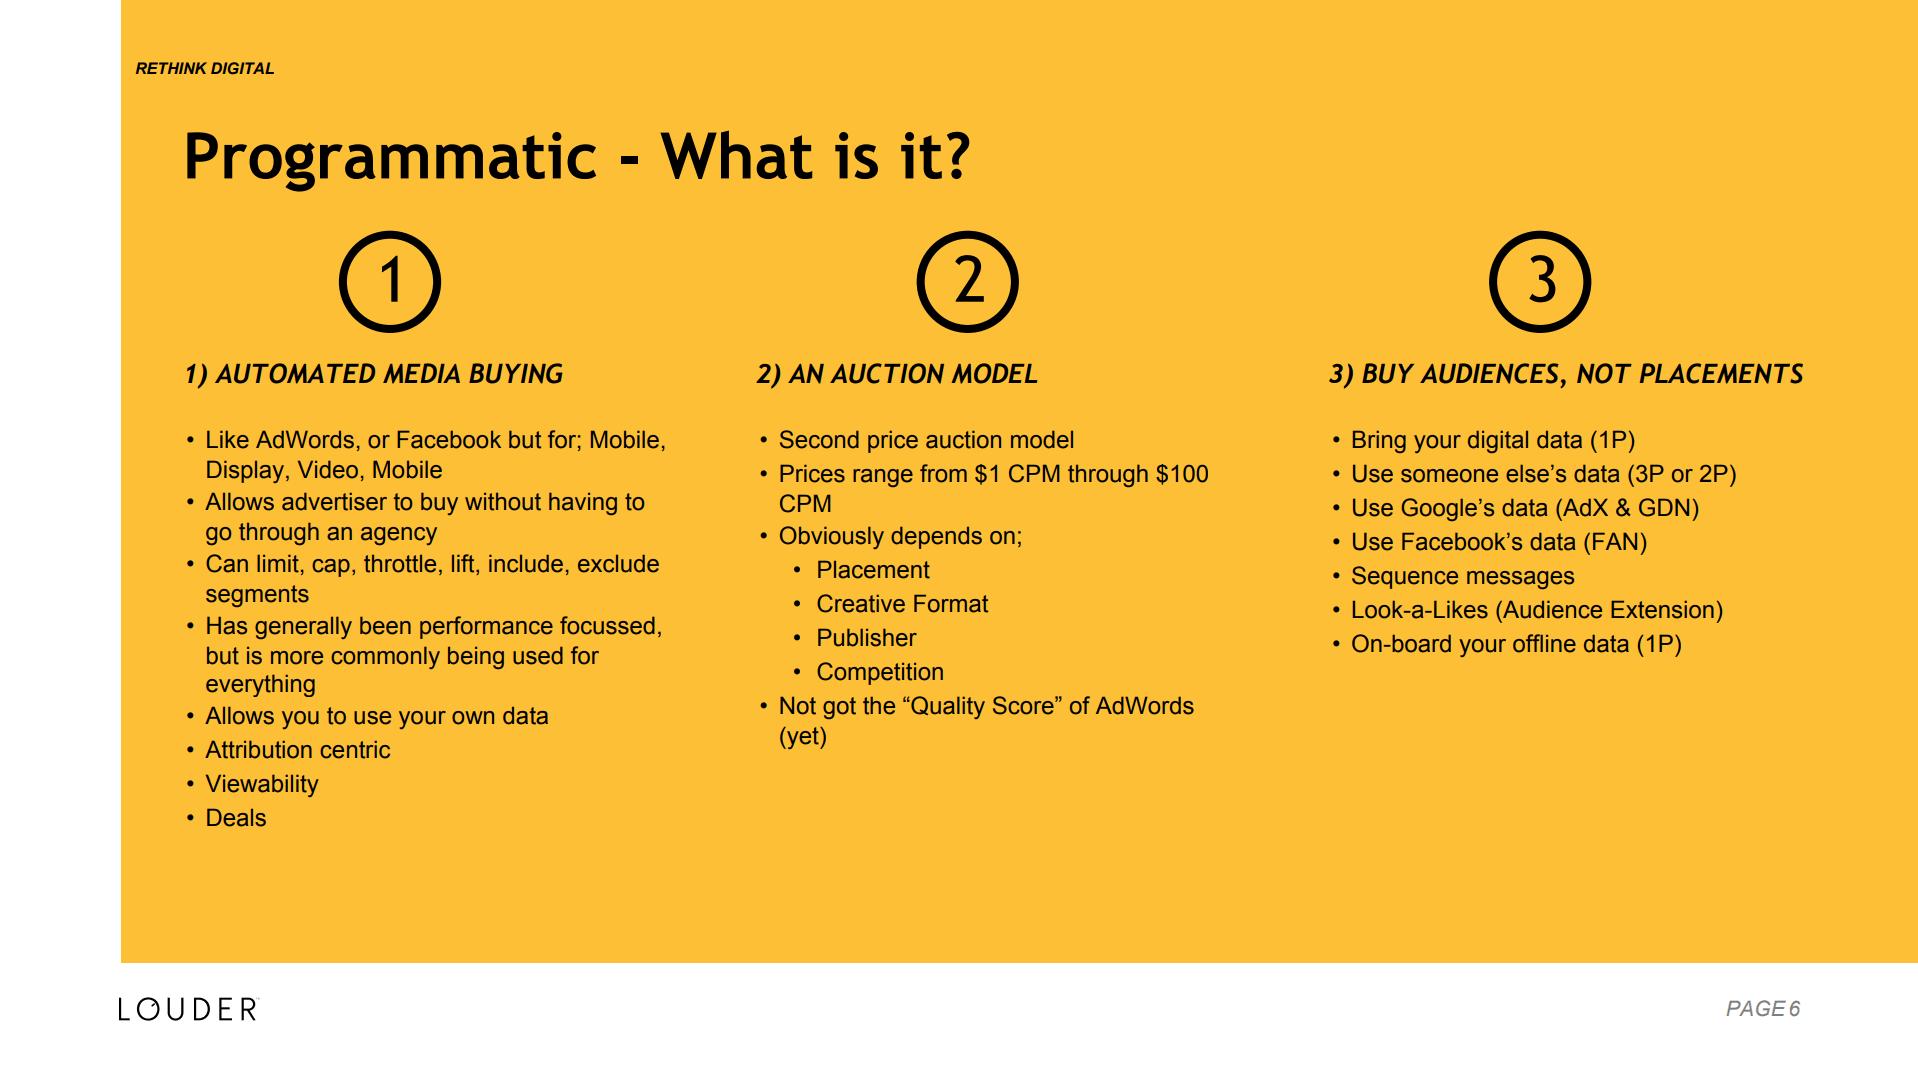 Programmatic, what is it?